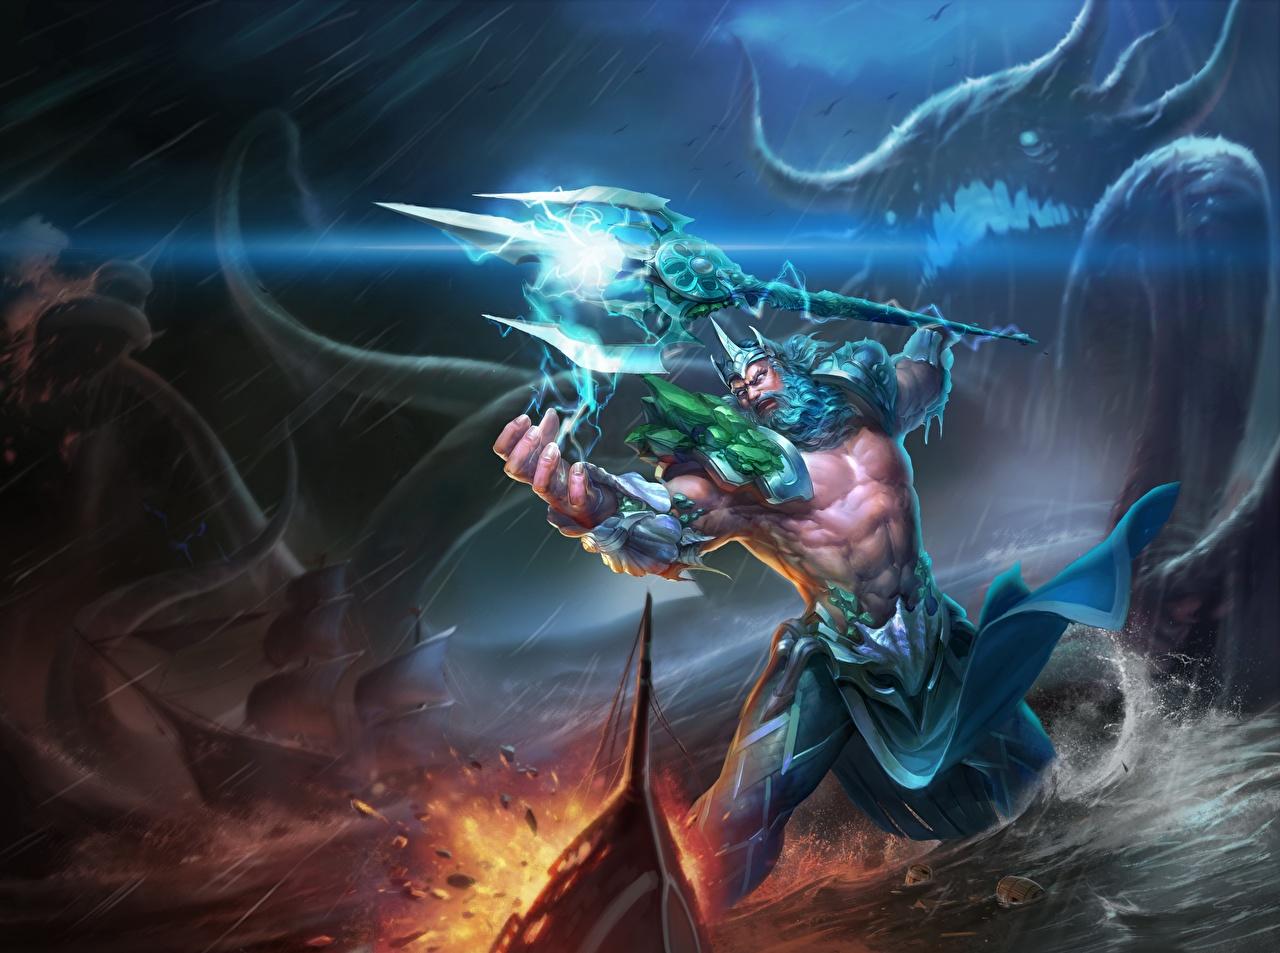 Фотографии Трезубец Воители Мужчины Poseidon, god of the seas Фэнтези трезубца воин воины мужчина Фантастика